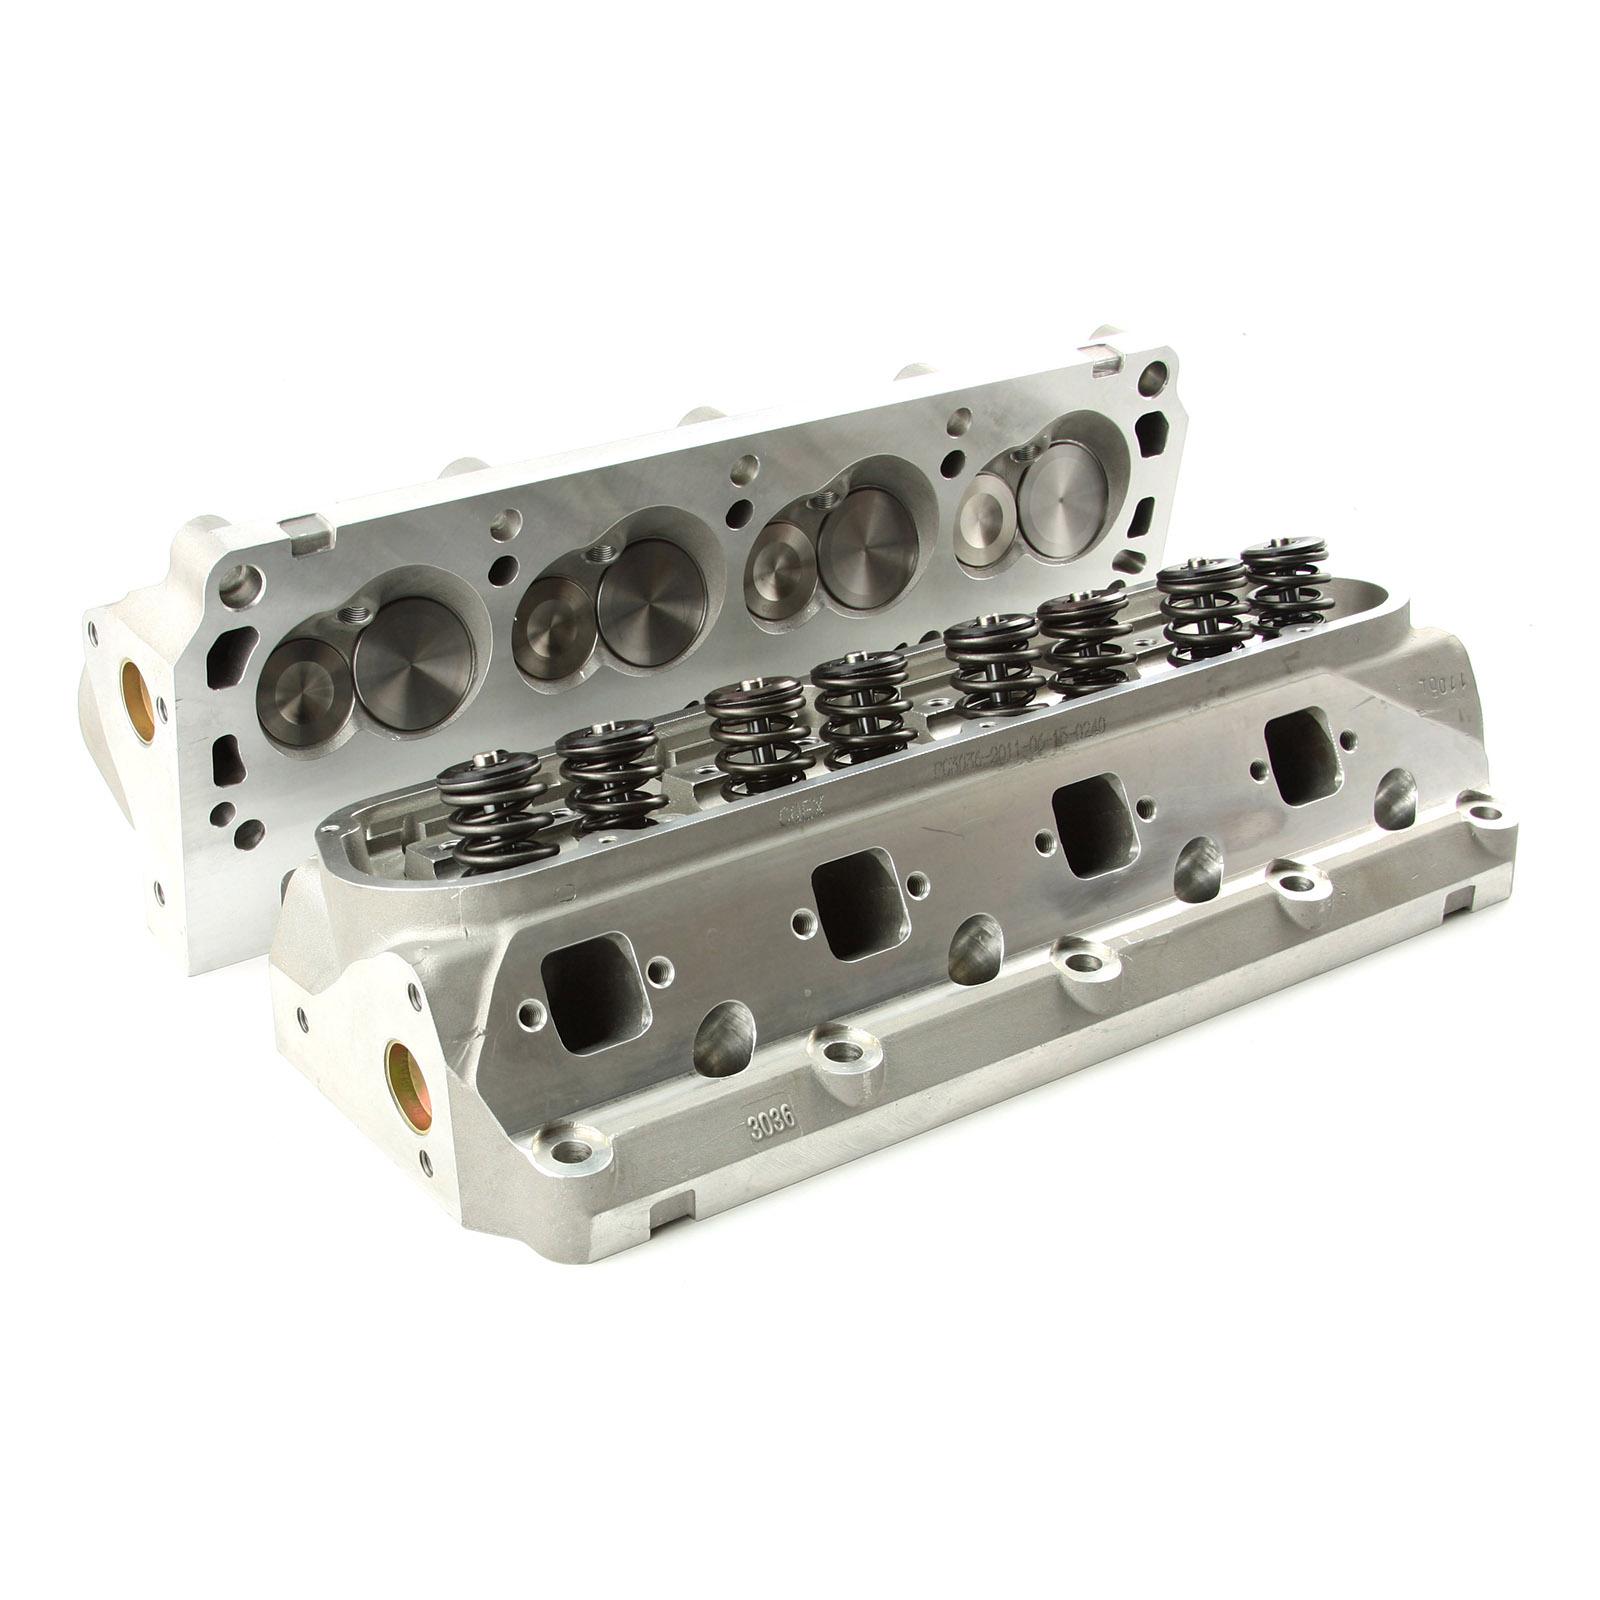 Ford 2 3 D Port Head: Ford SB 289 302 351W 175cc 62cc Solid-FT Complete Aluminum